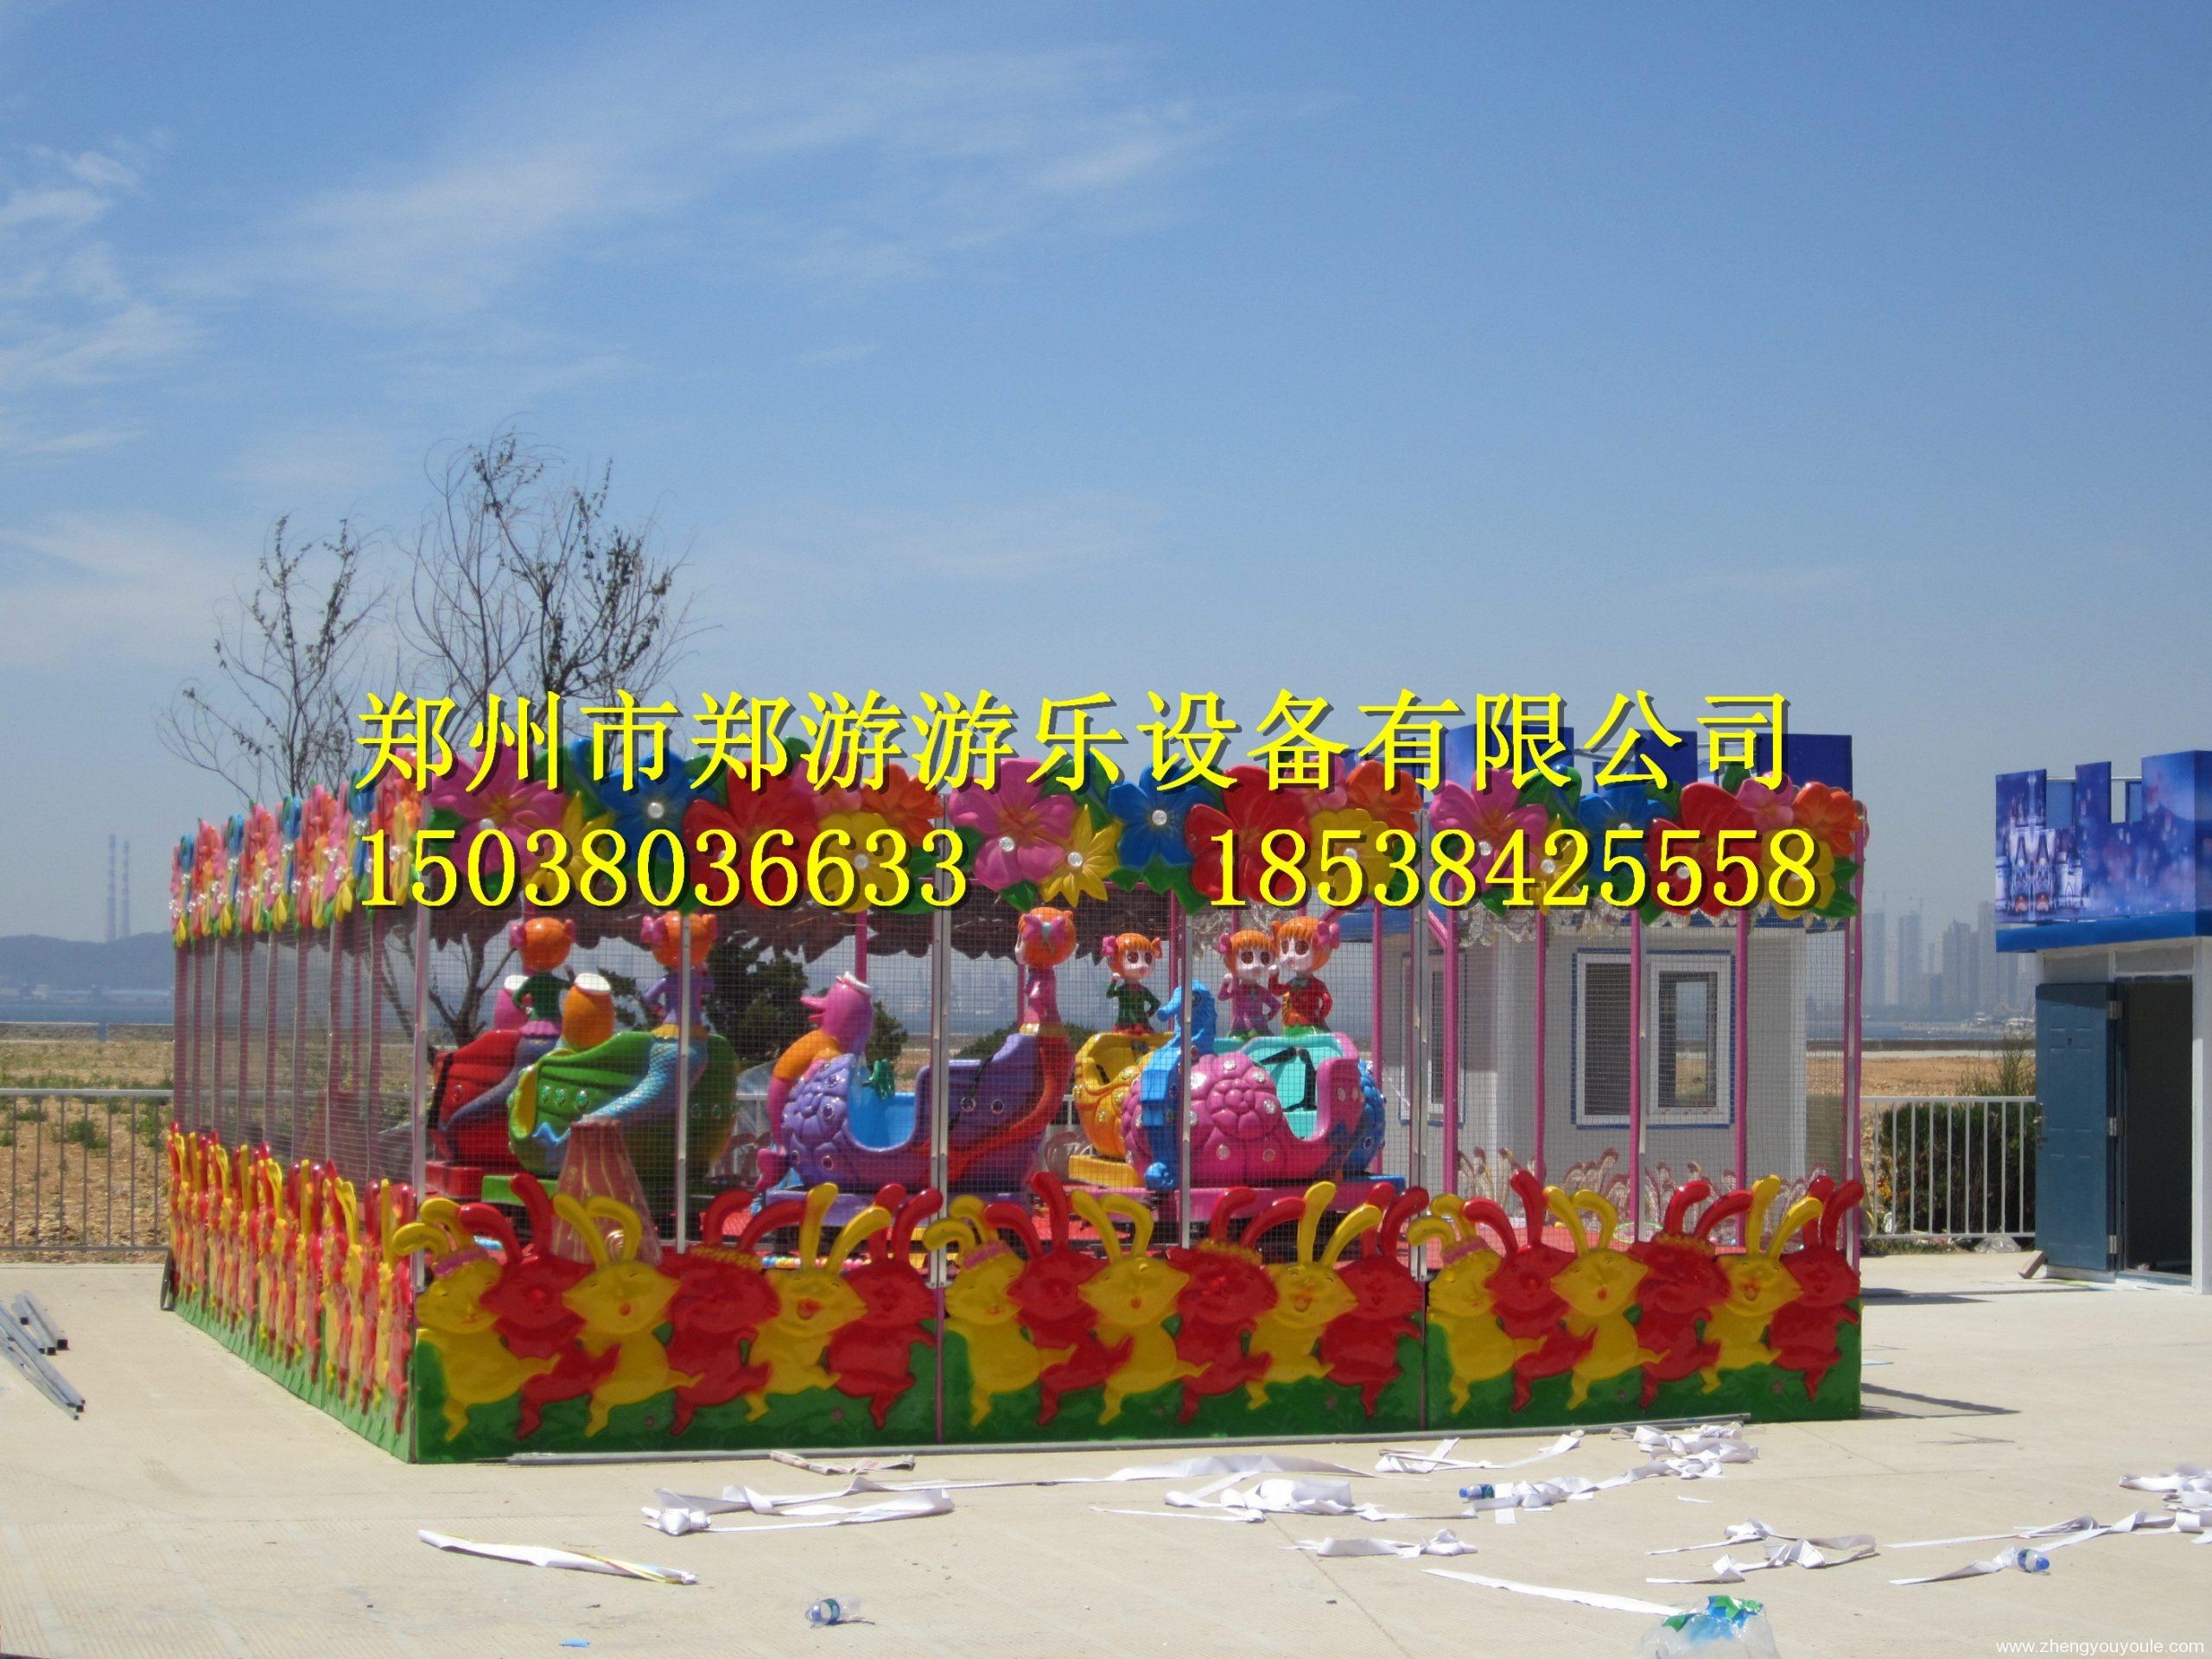 2020030601535248 scaled - 轨道类—欢乐喷球车